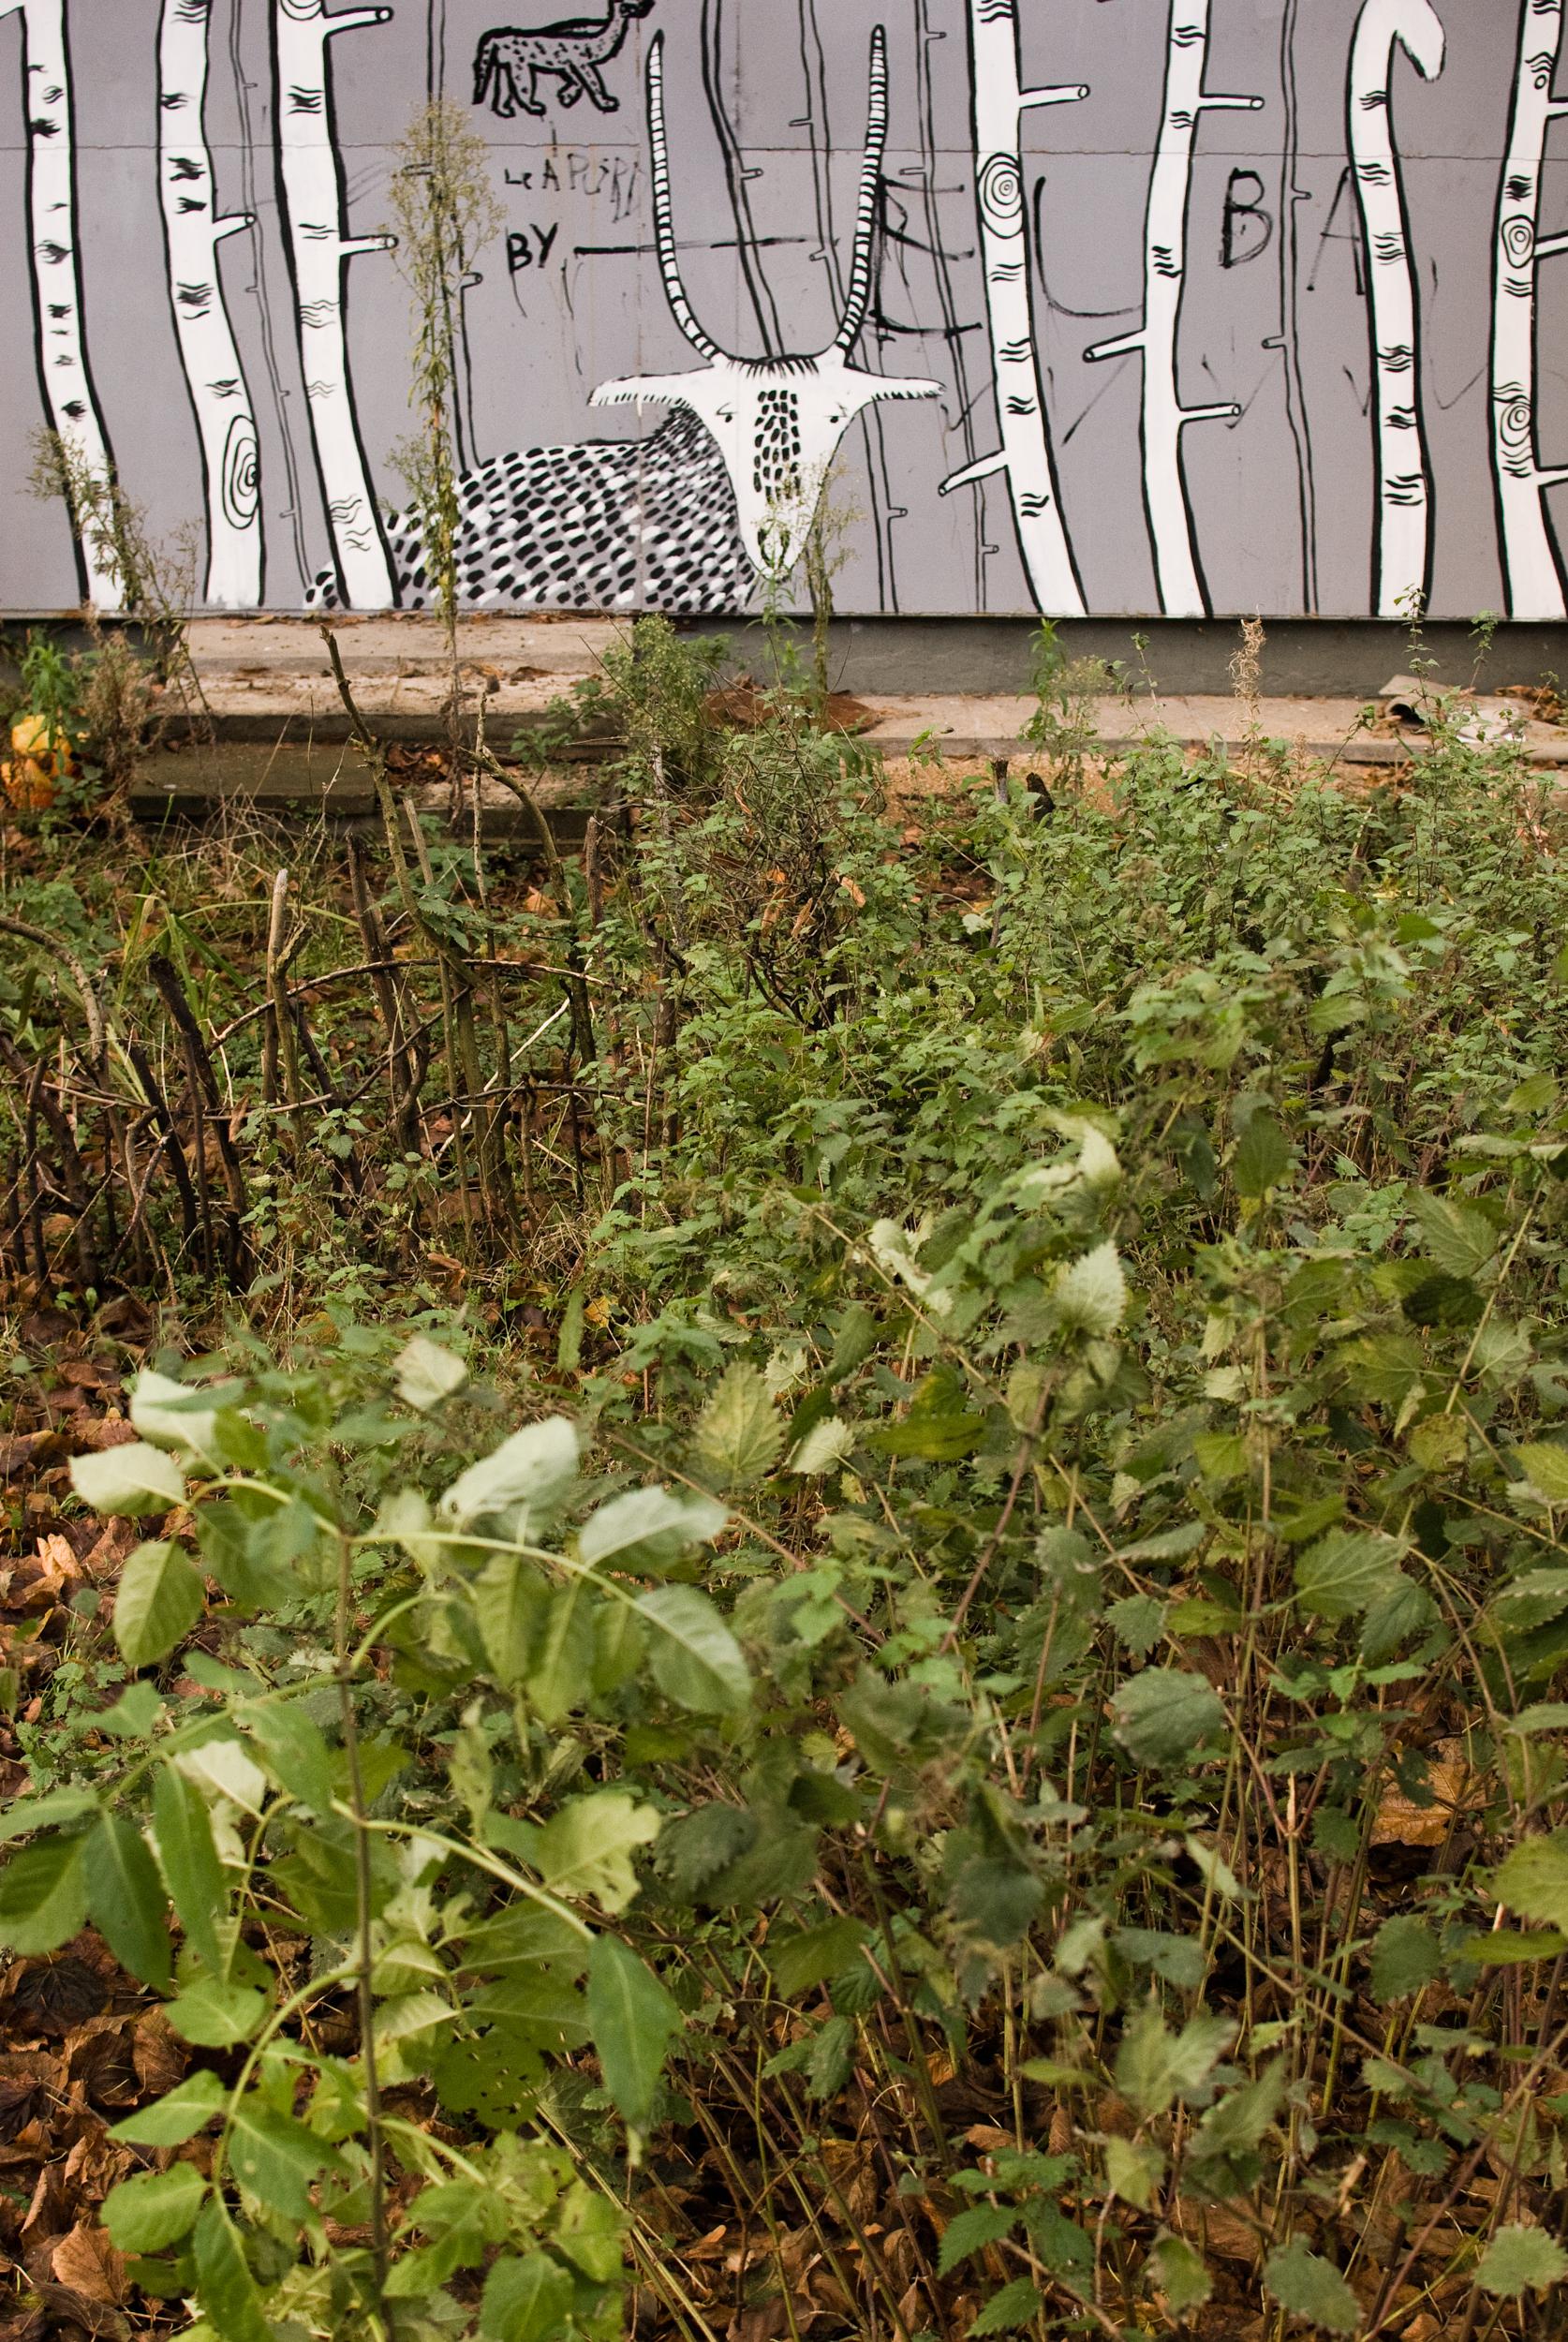 Georgina_cook_Heygate_estate_wildlife_garden.jpg